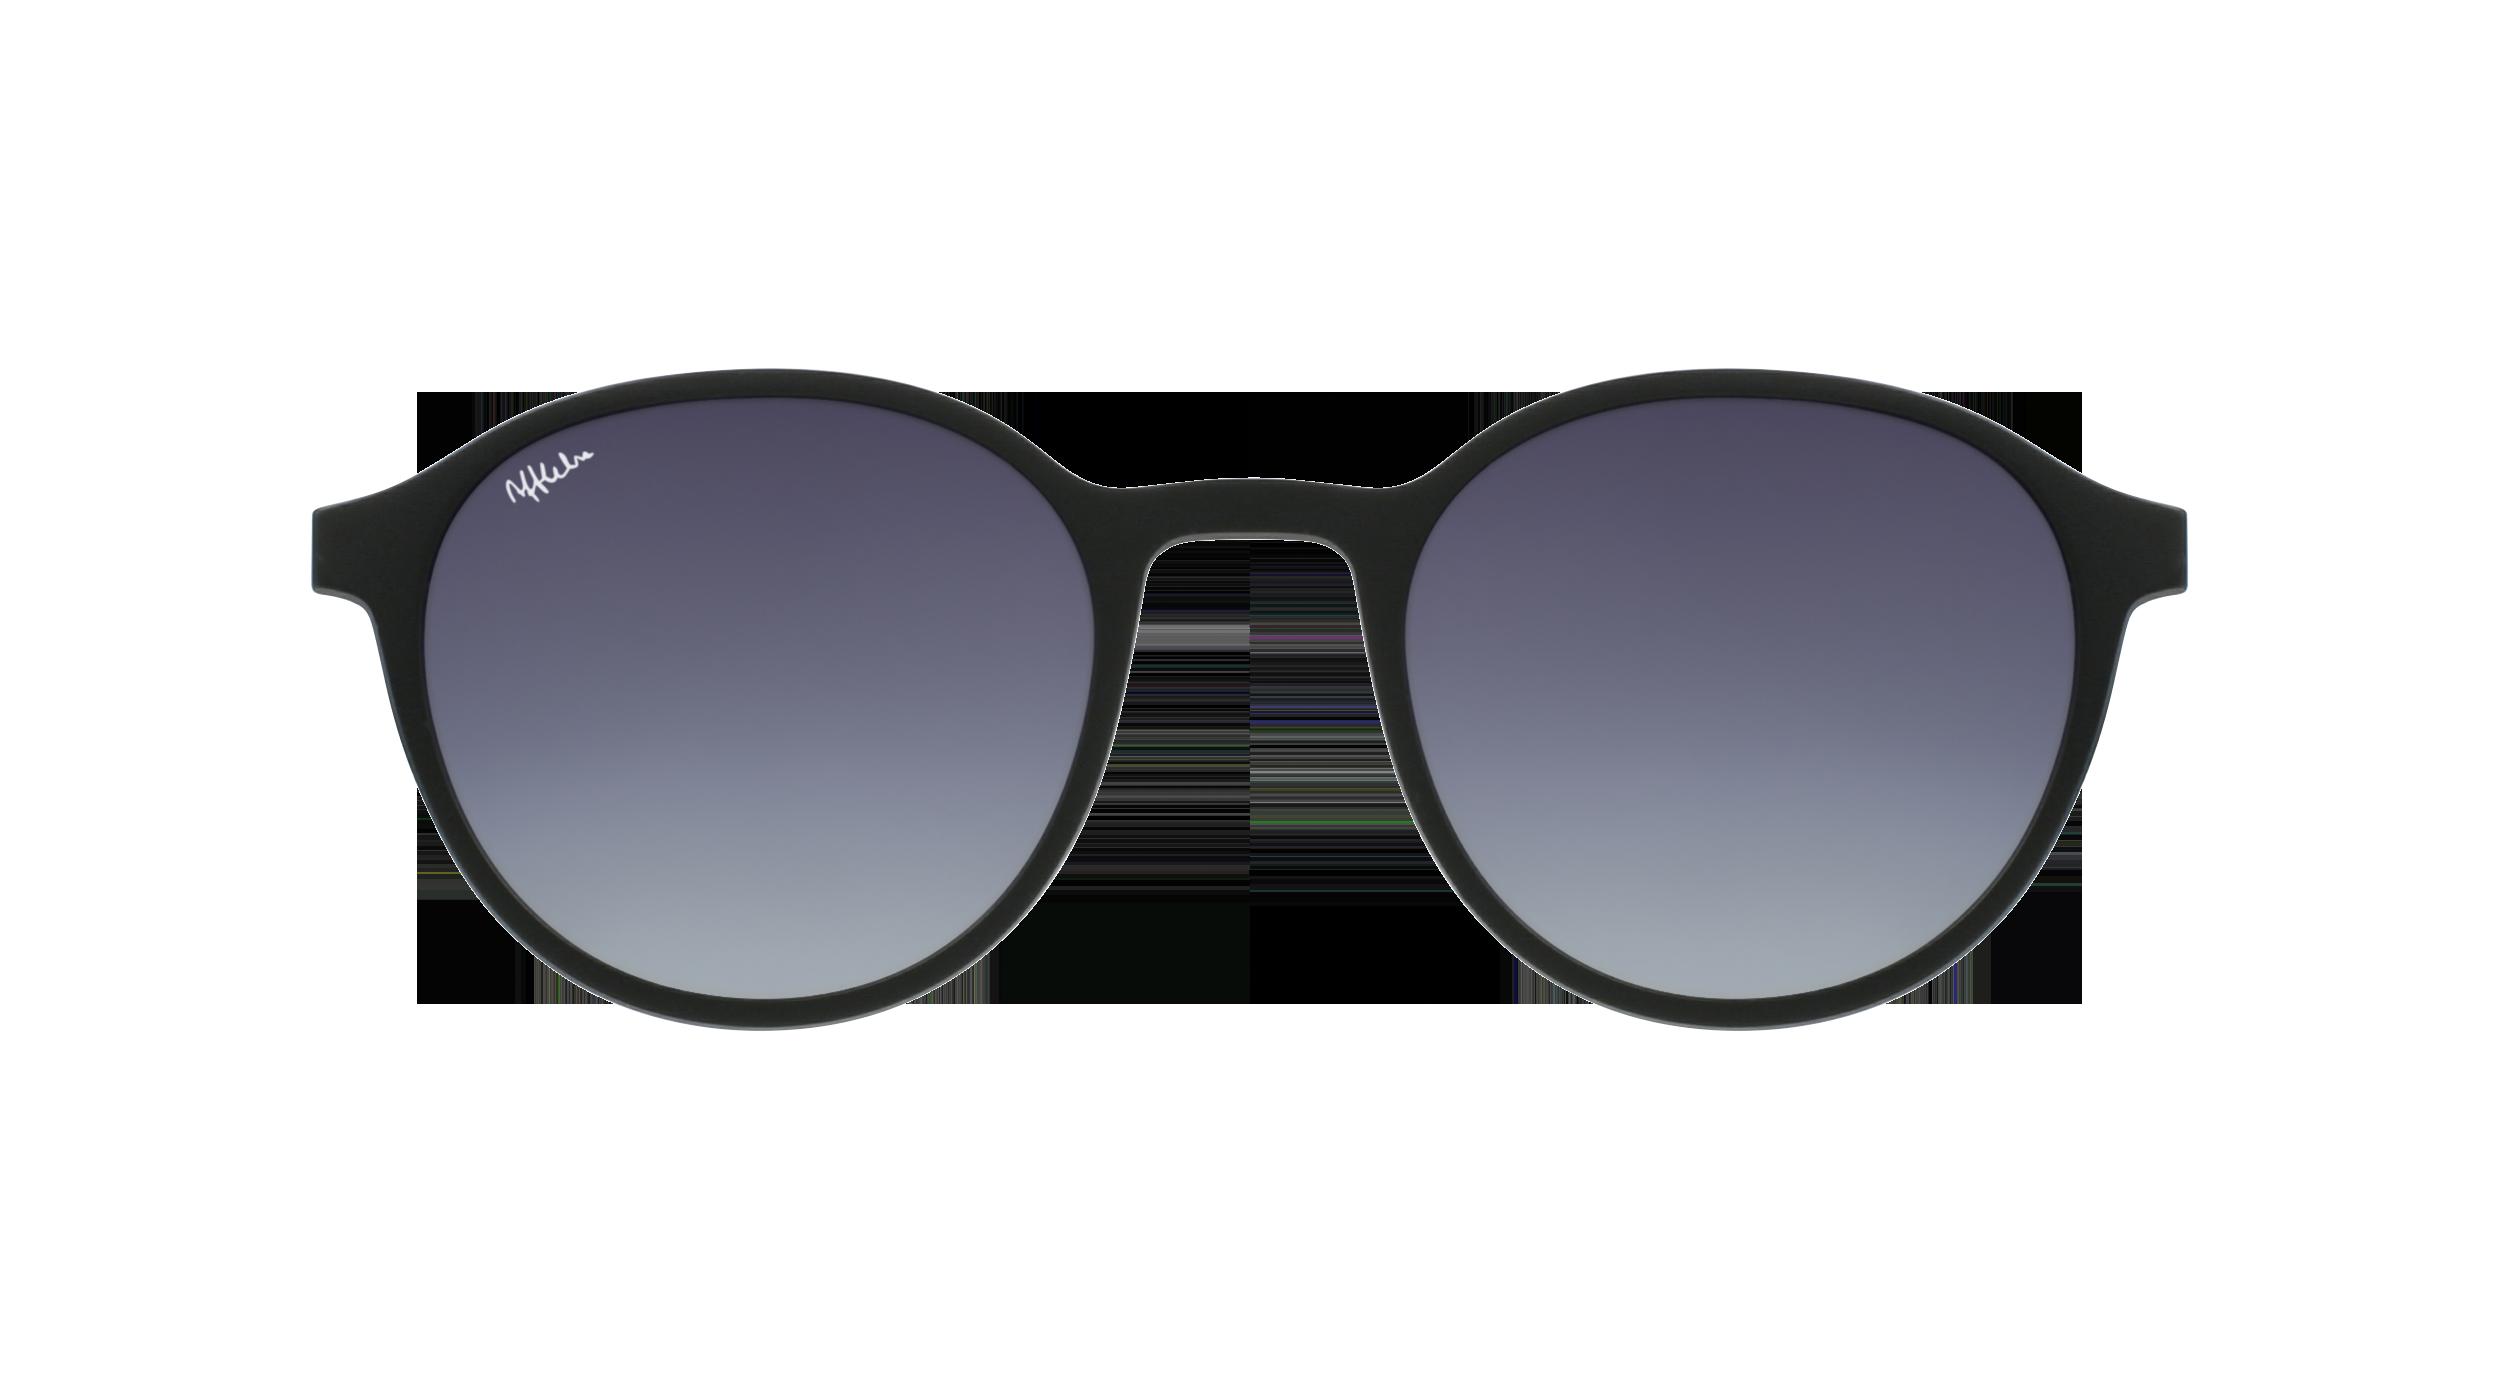 afflelou/france/products/smart_clip/clips_glasses/07630036458839.png